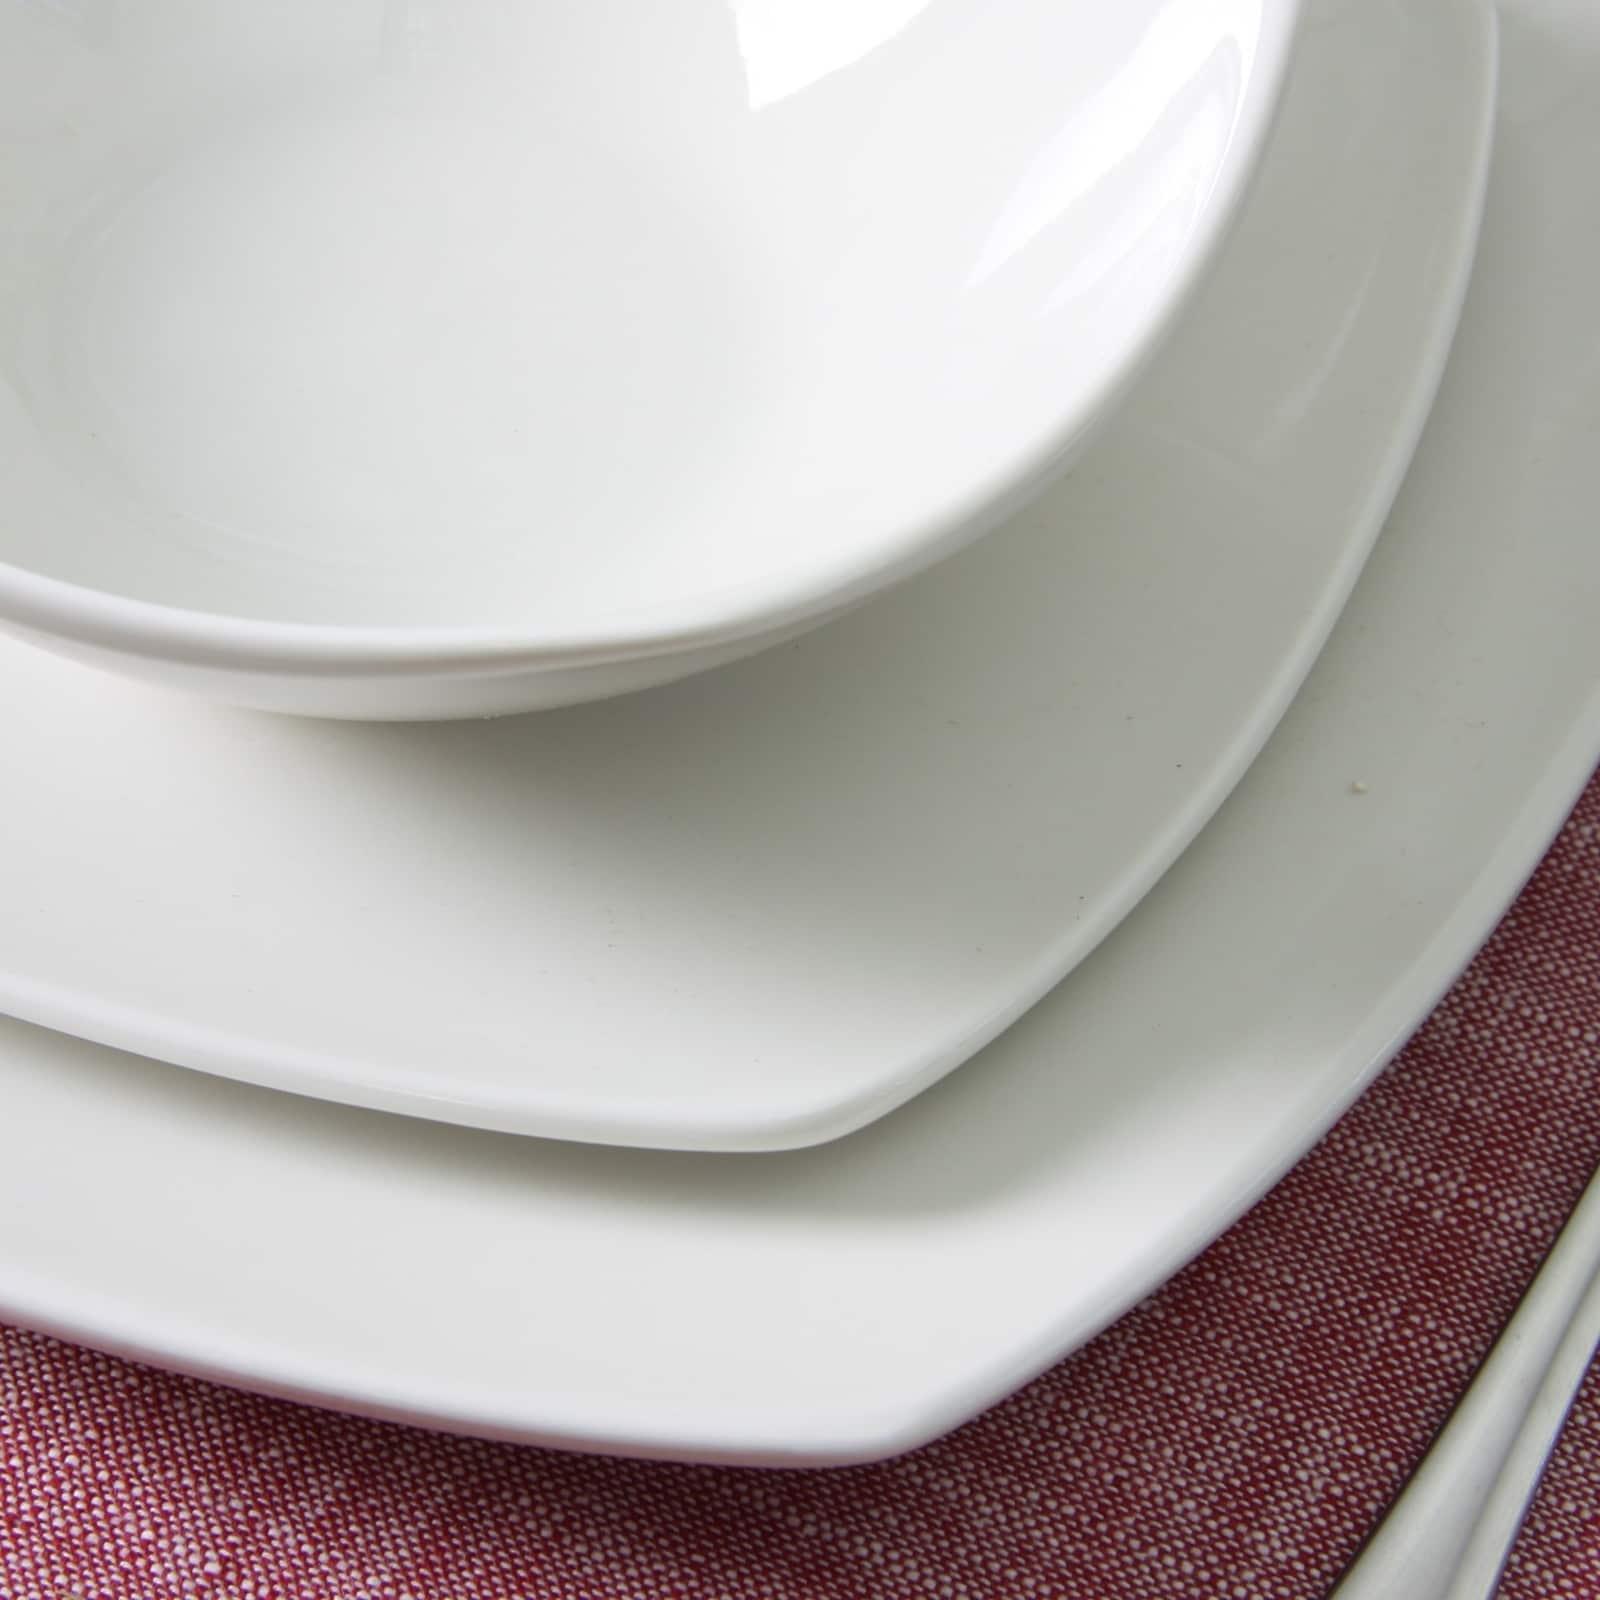 Zen Buffetware 30 pc Dinnerware Set - Free Shipping Today - Overstock - 24263850 & Zen Buffetware 30 pc Dinnerware Set - Free Shipping Today ...